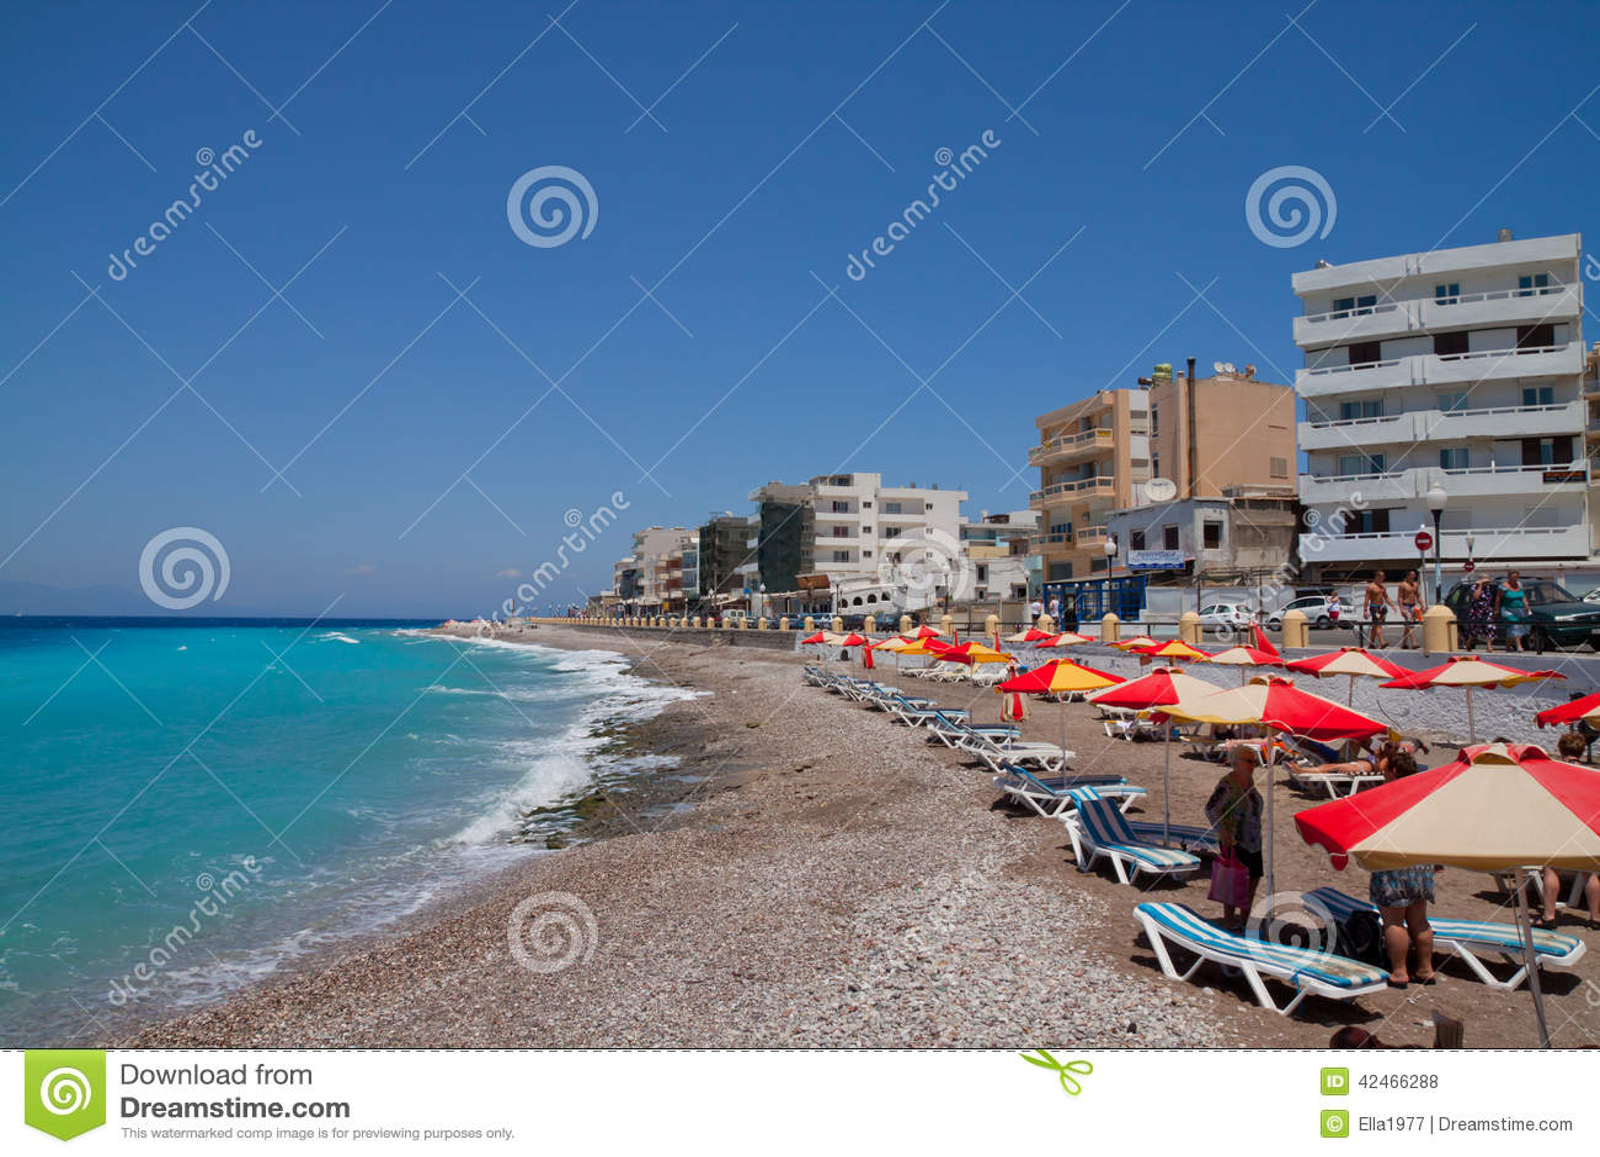 Das Ägäische Meer rhodes Griechenland